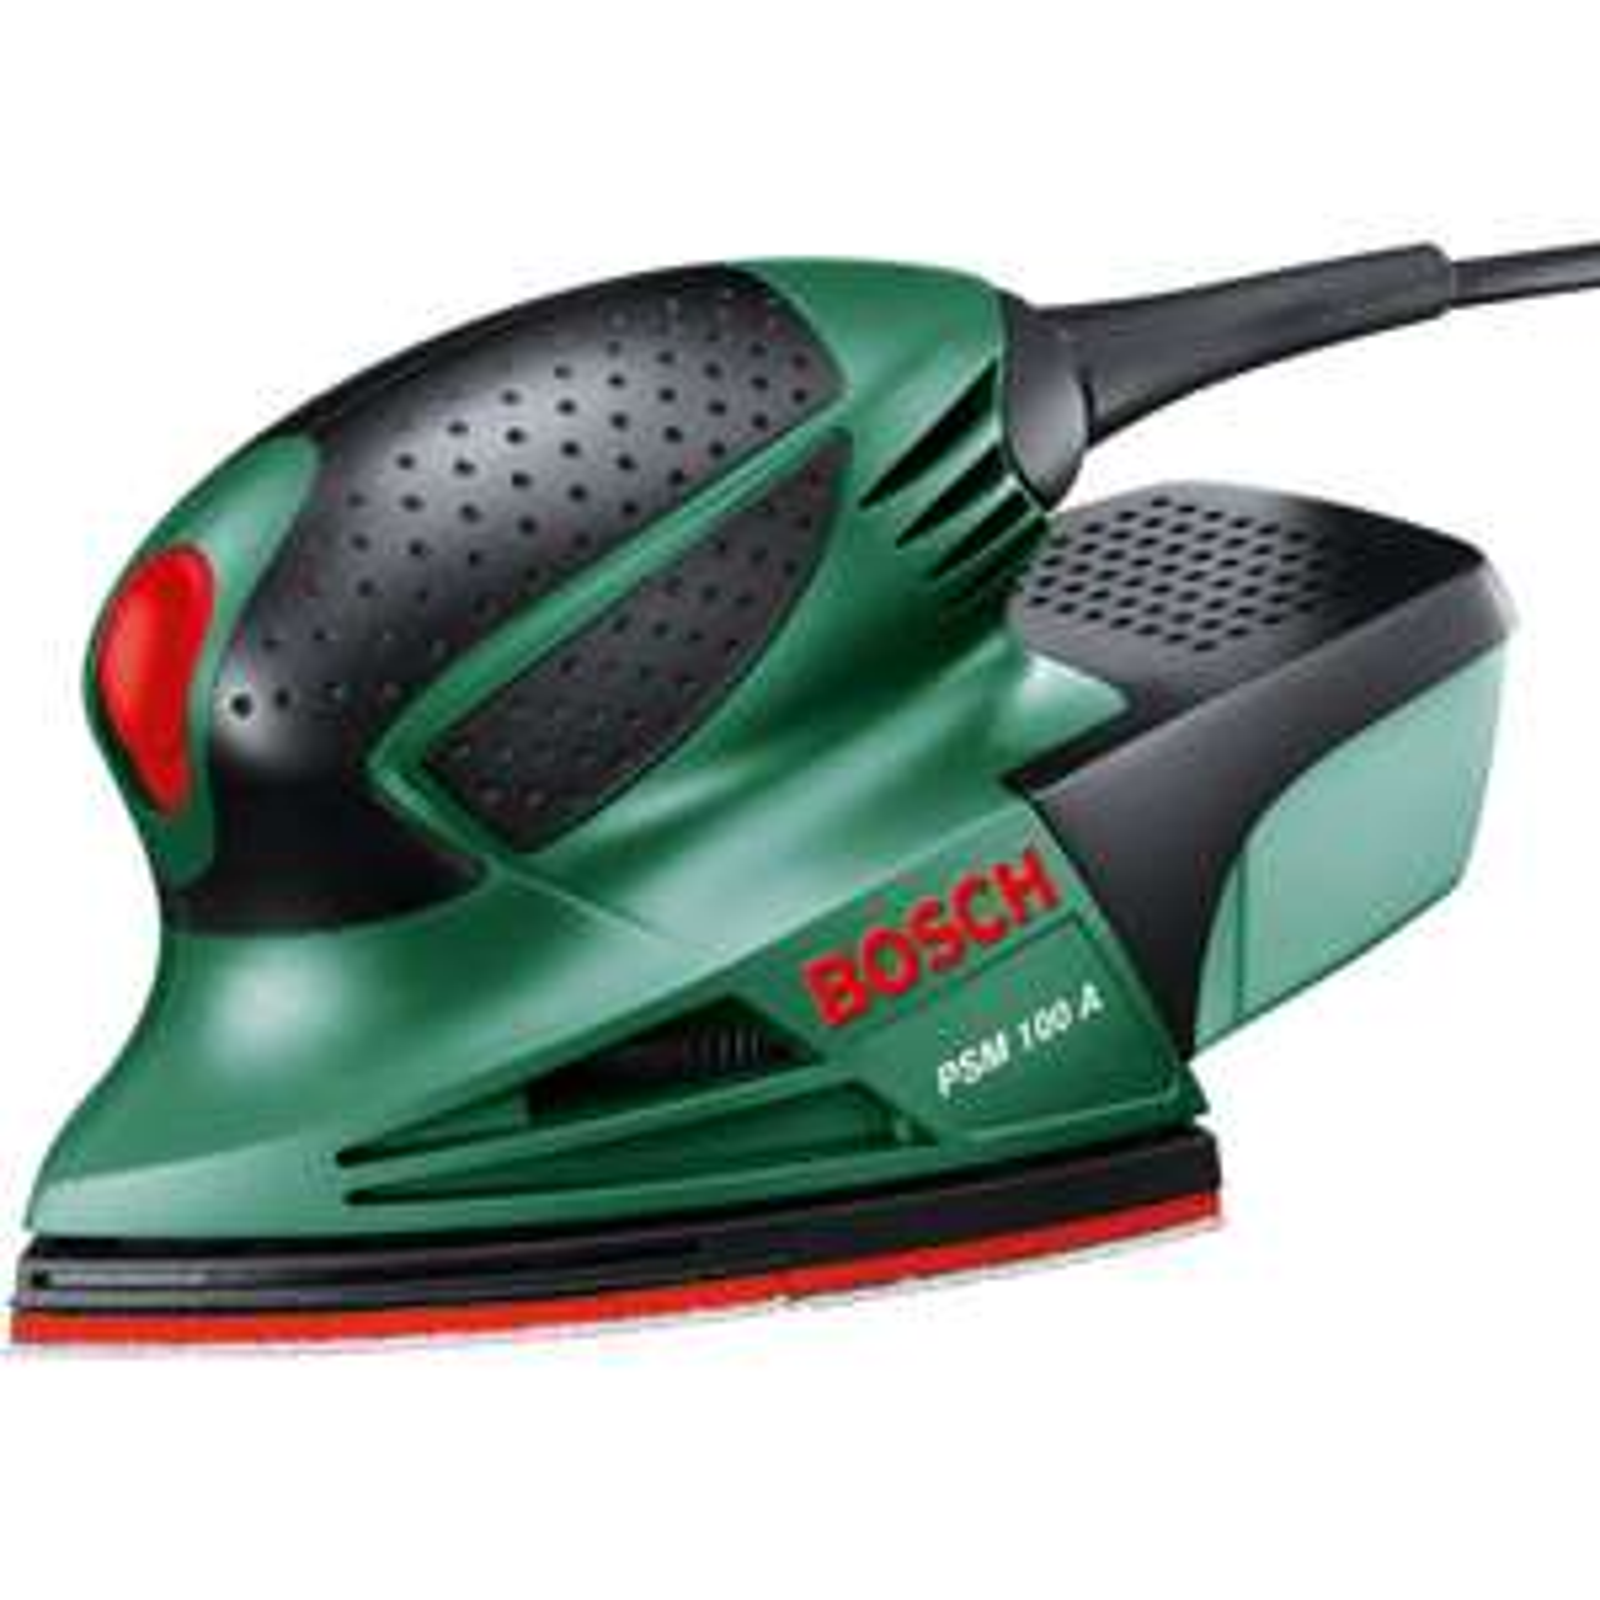 Bosch PSM 100 A Multi-Sander £24.99 @ Amazon